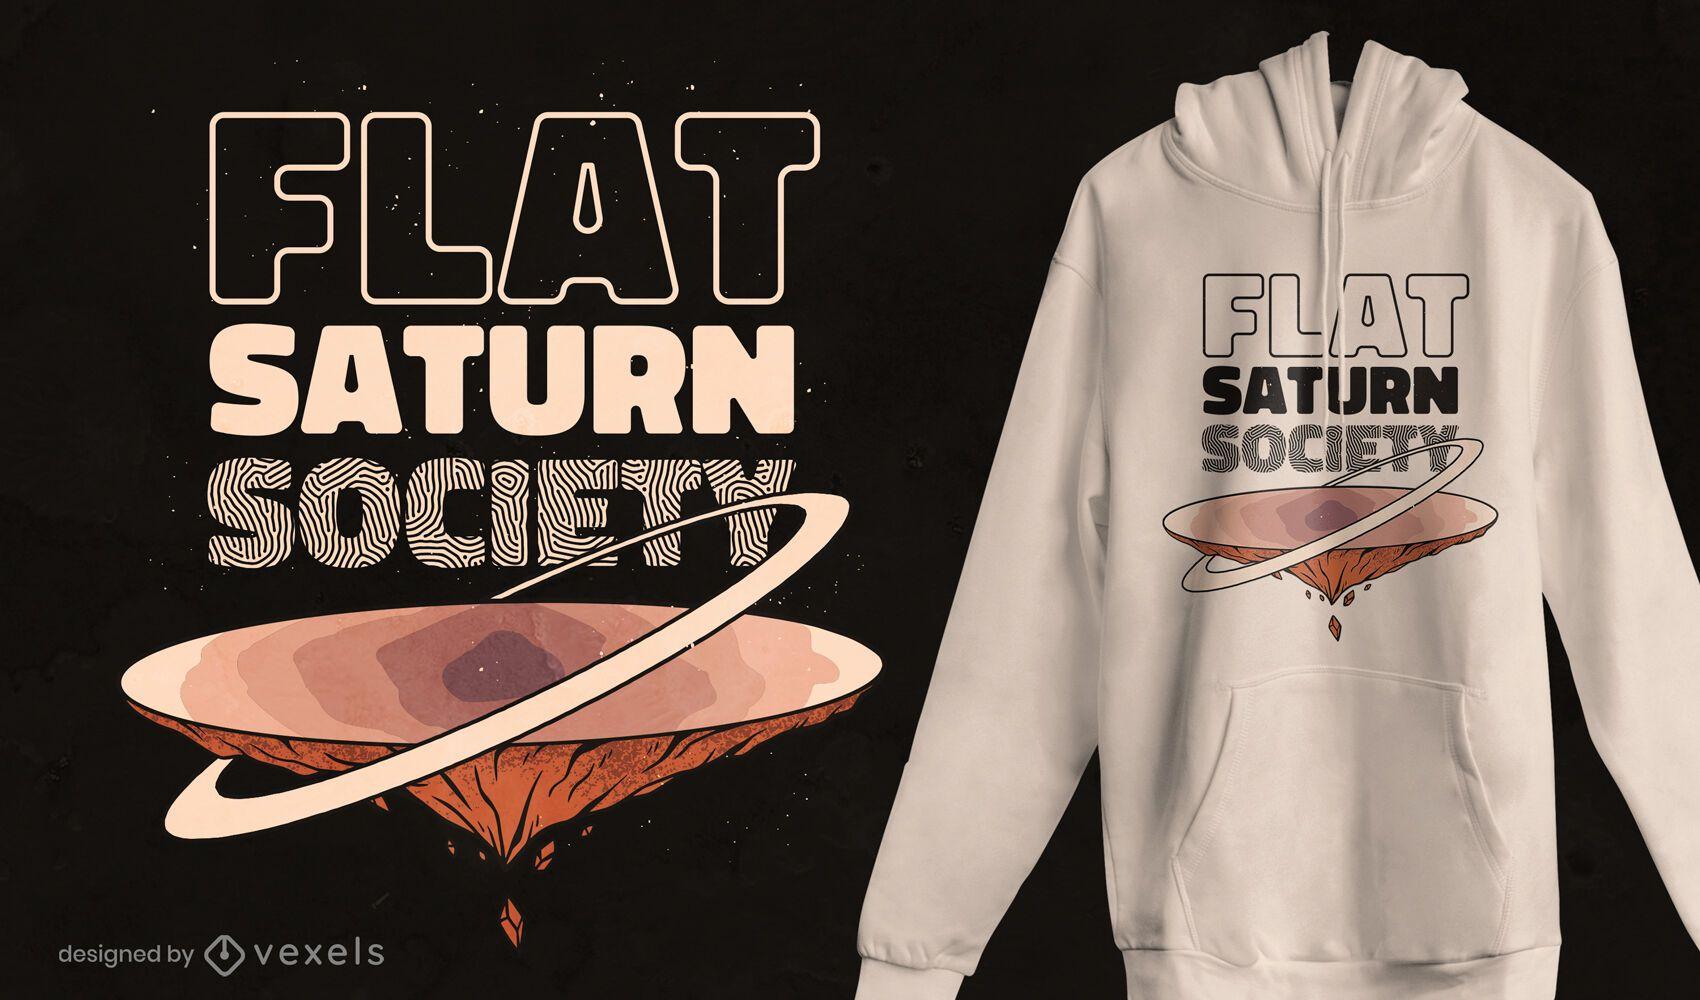 Flat saturn society t-shirt design